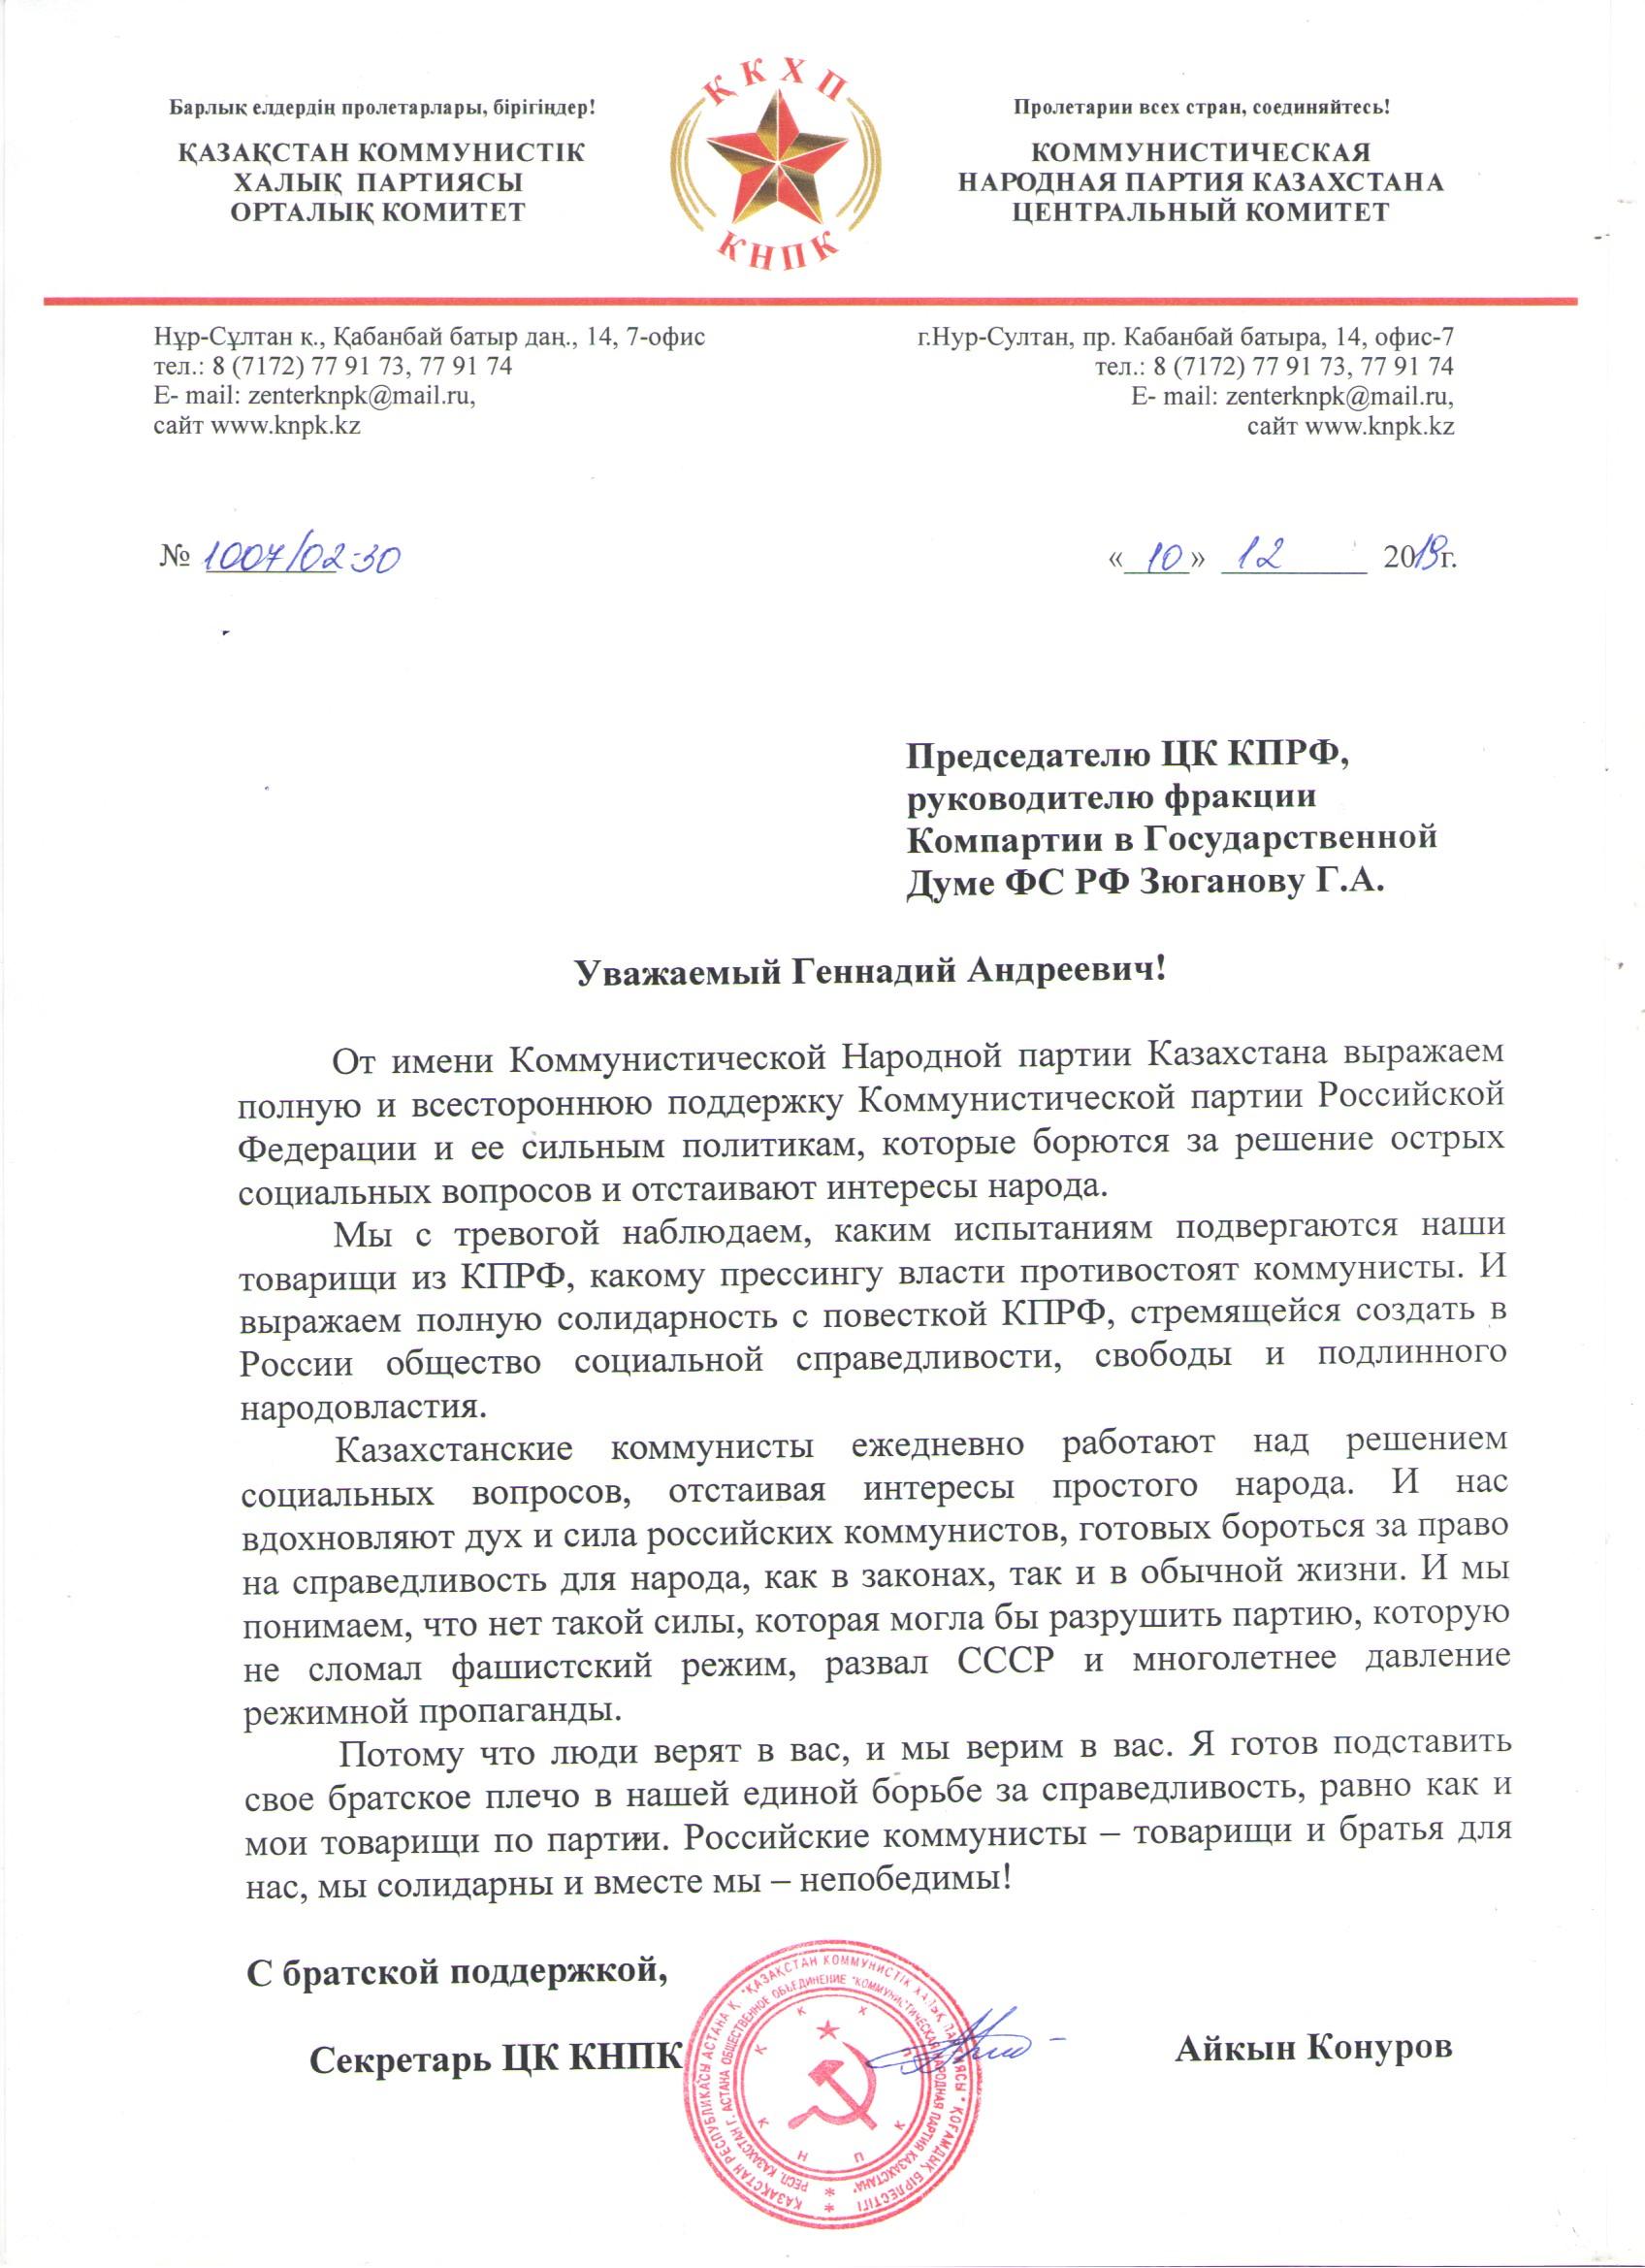 Уважаемый Геннадий Андреевич!